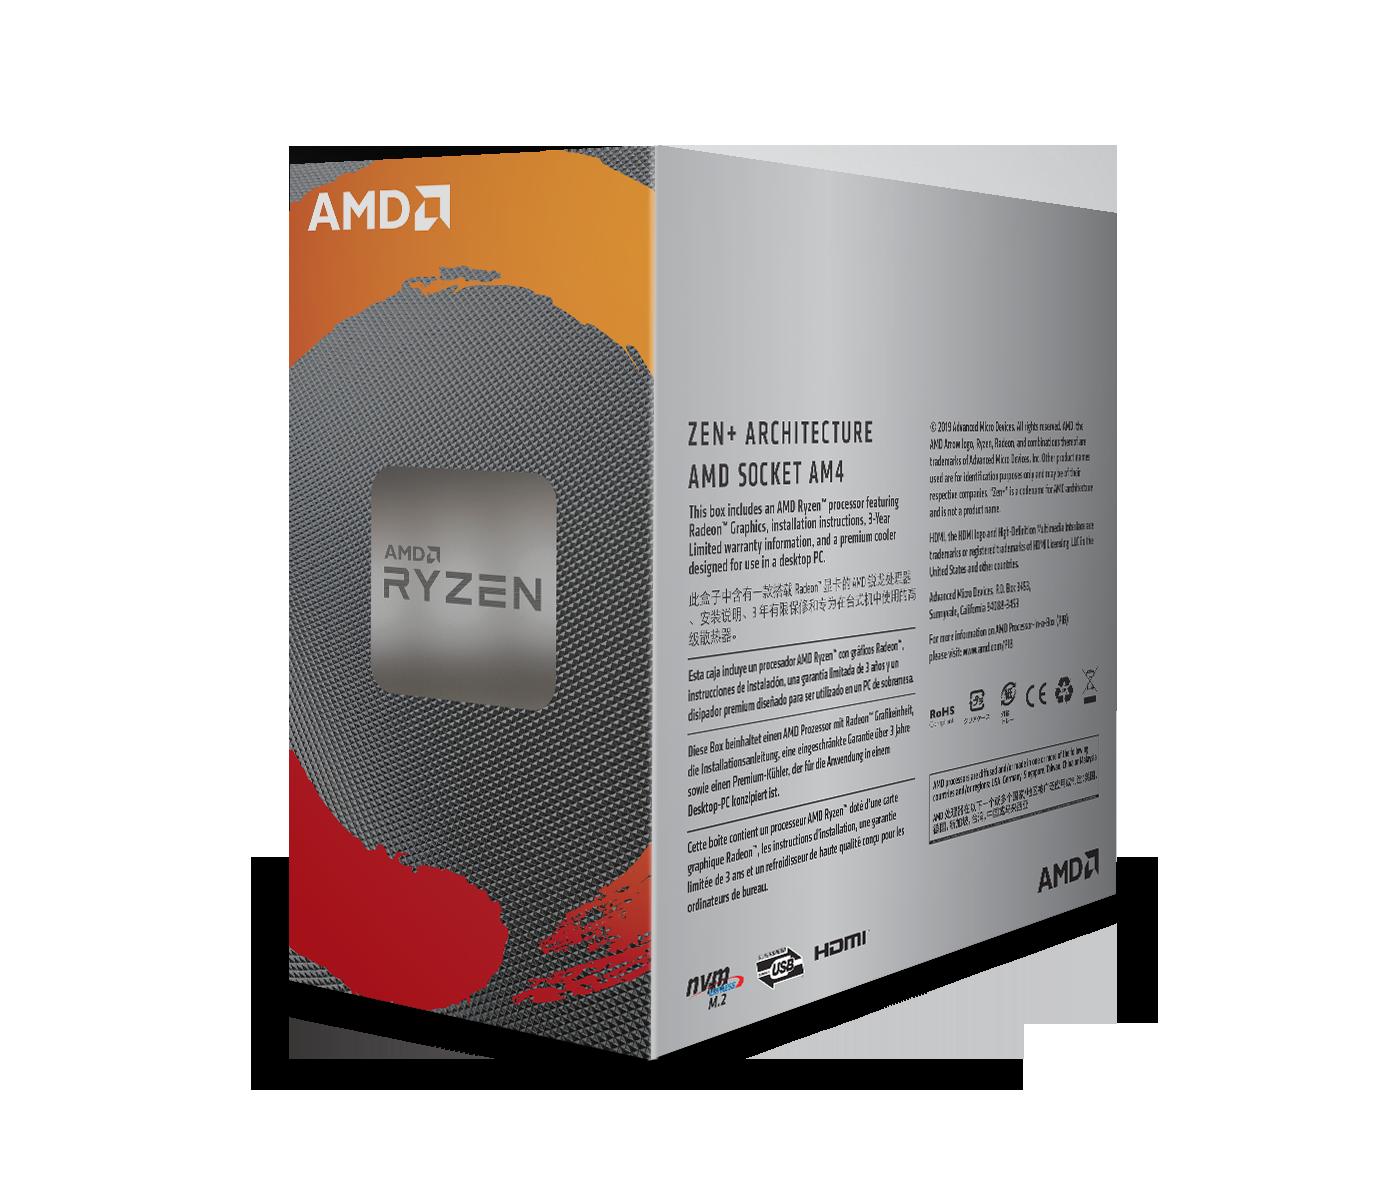 AMD Ryzen 3 3200G /6MB /3.6GHz /4 nhân 4 luồng